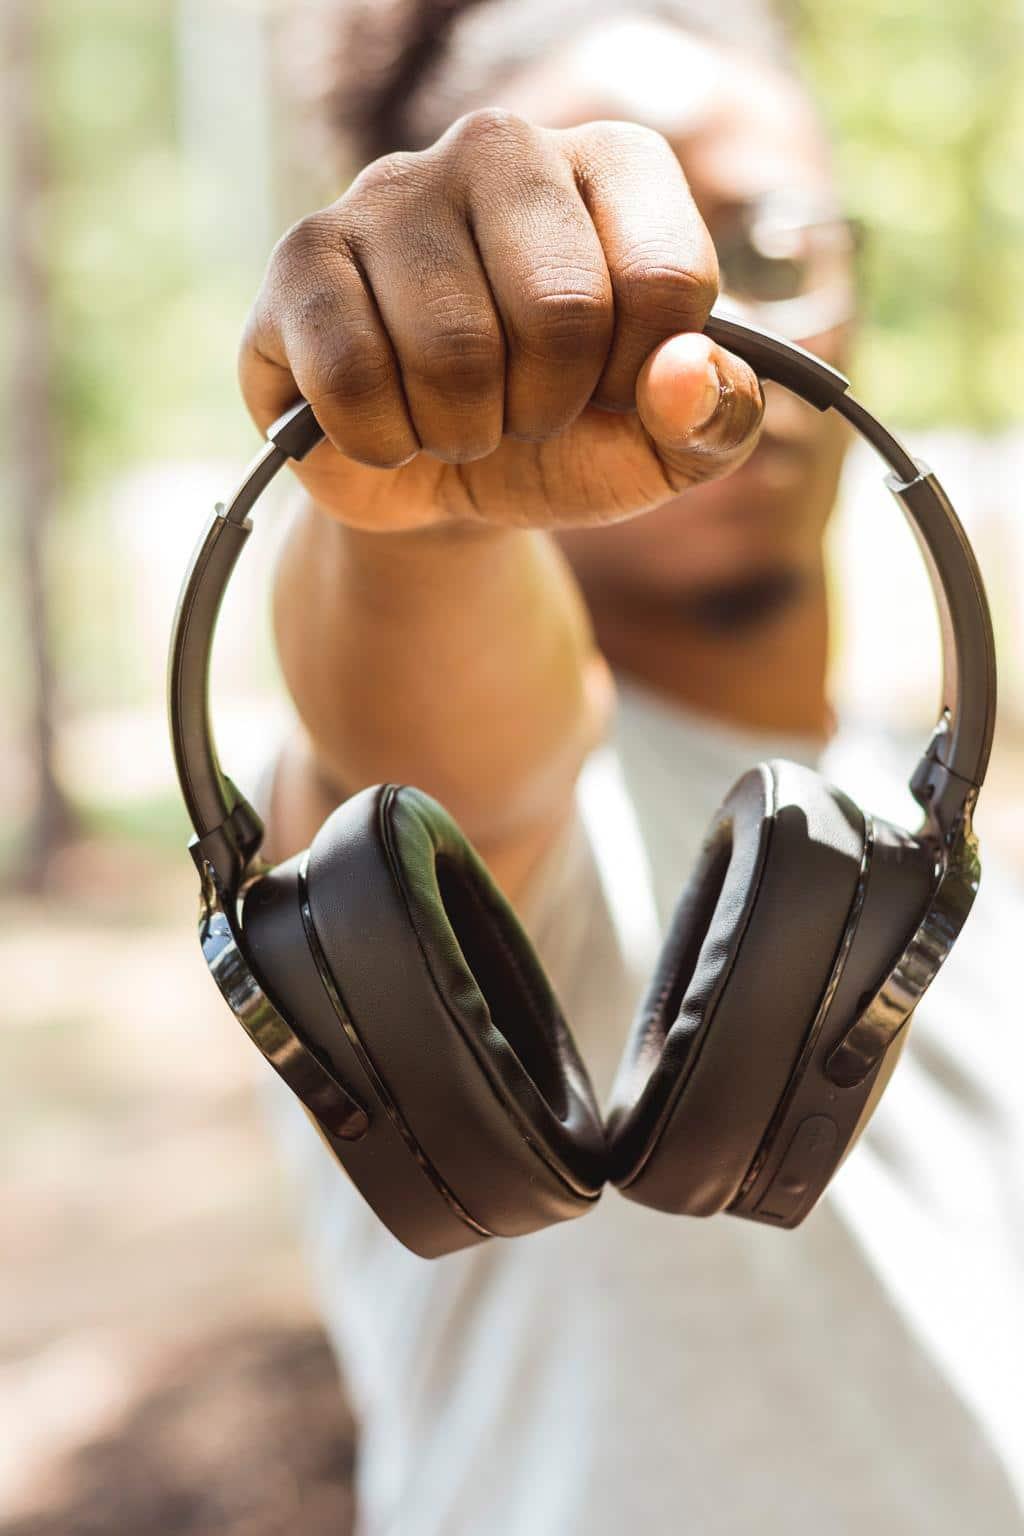 comparatif casque audio bluetooth - Blog SFAM